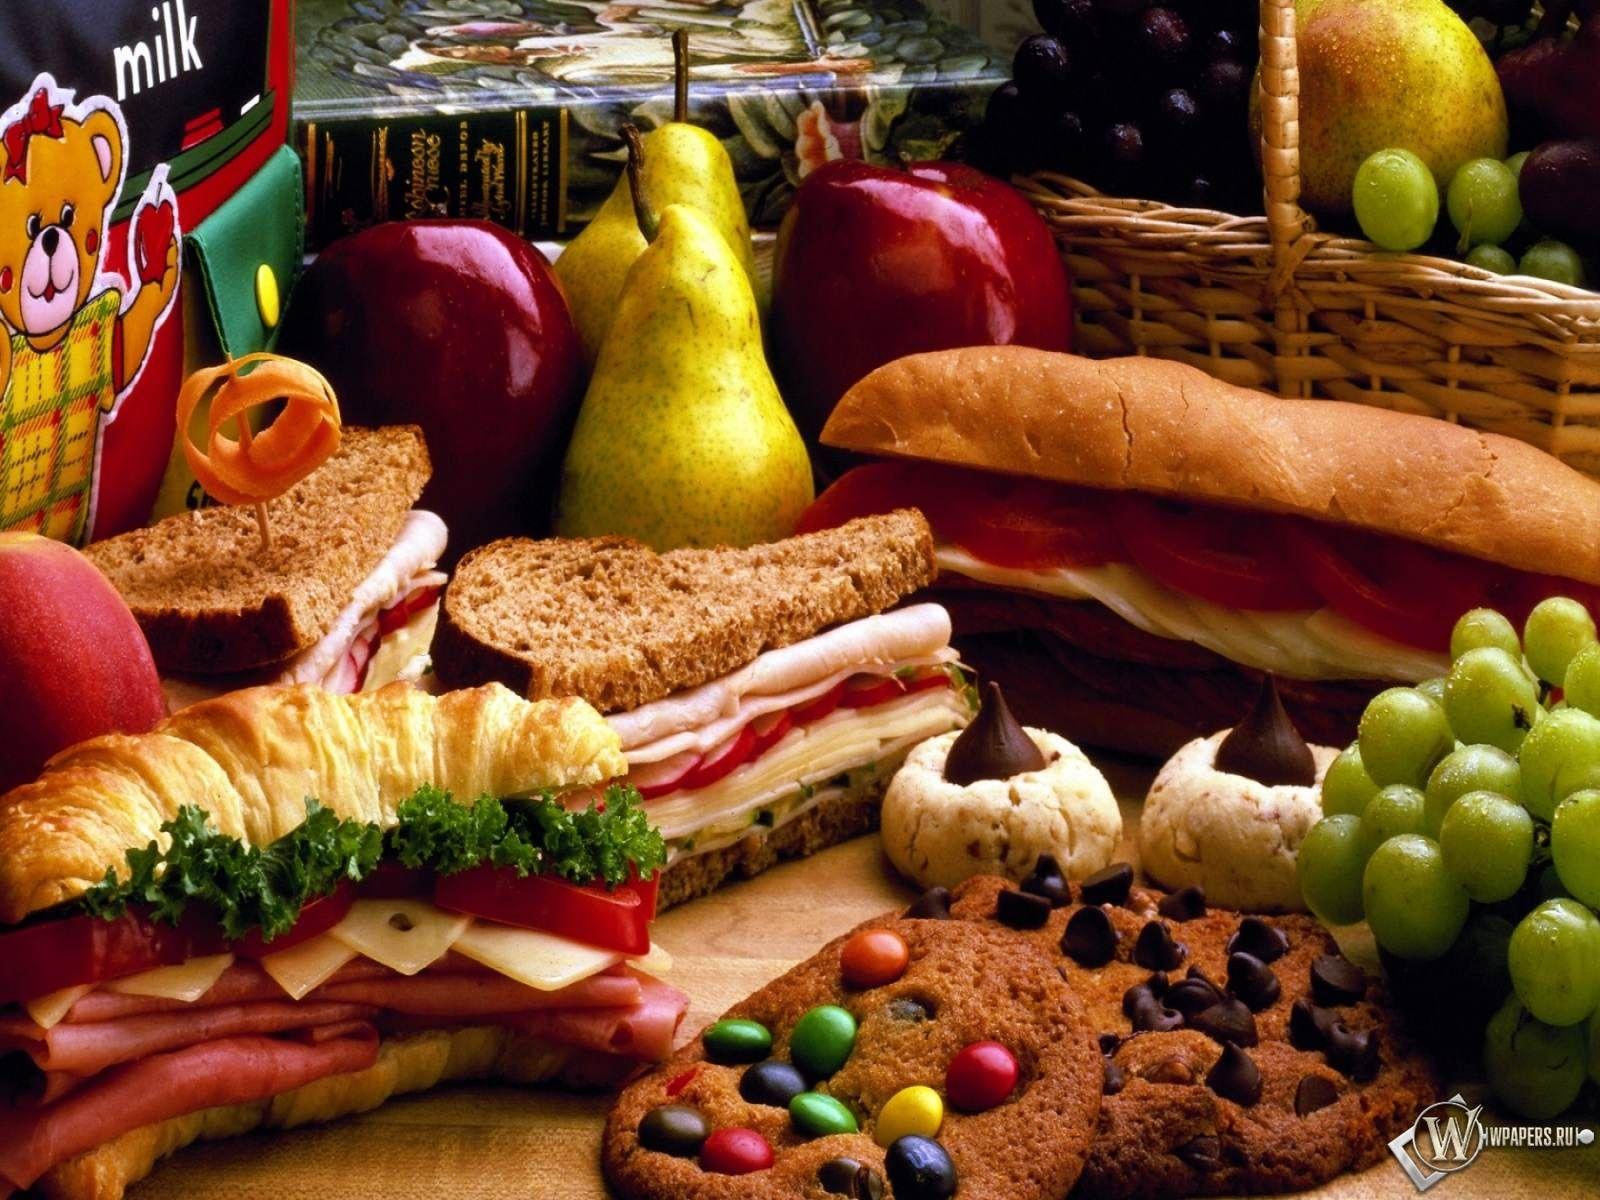 Picnic Lunch | Recipes, Food, Food wallpaper